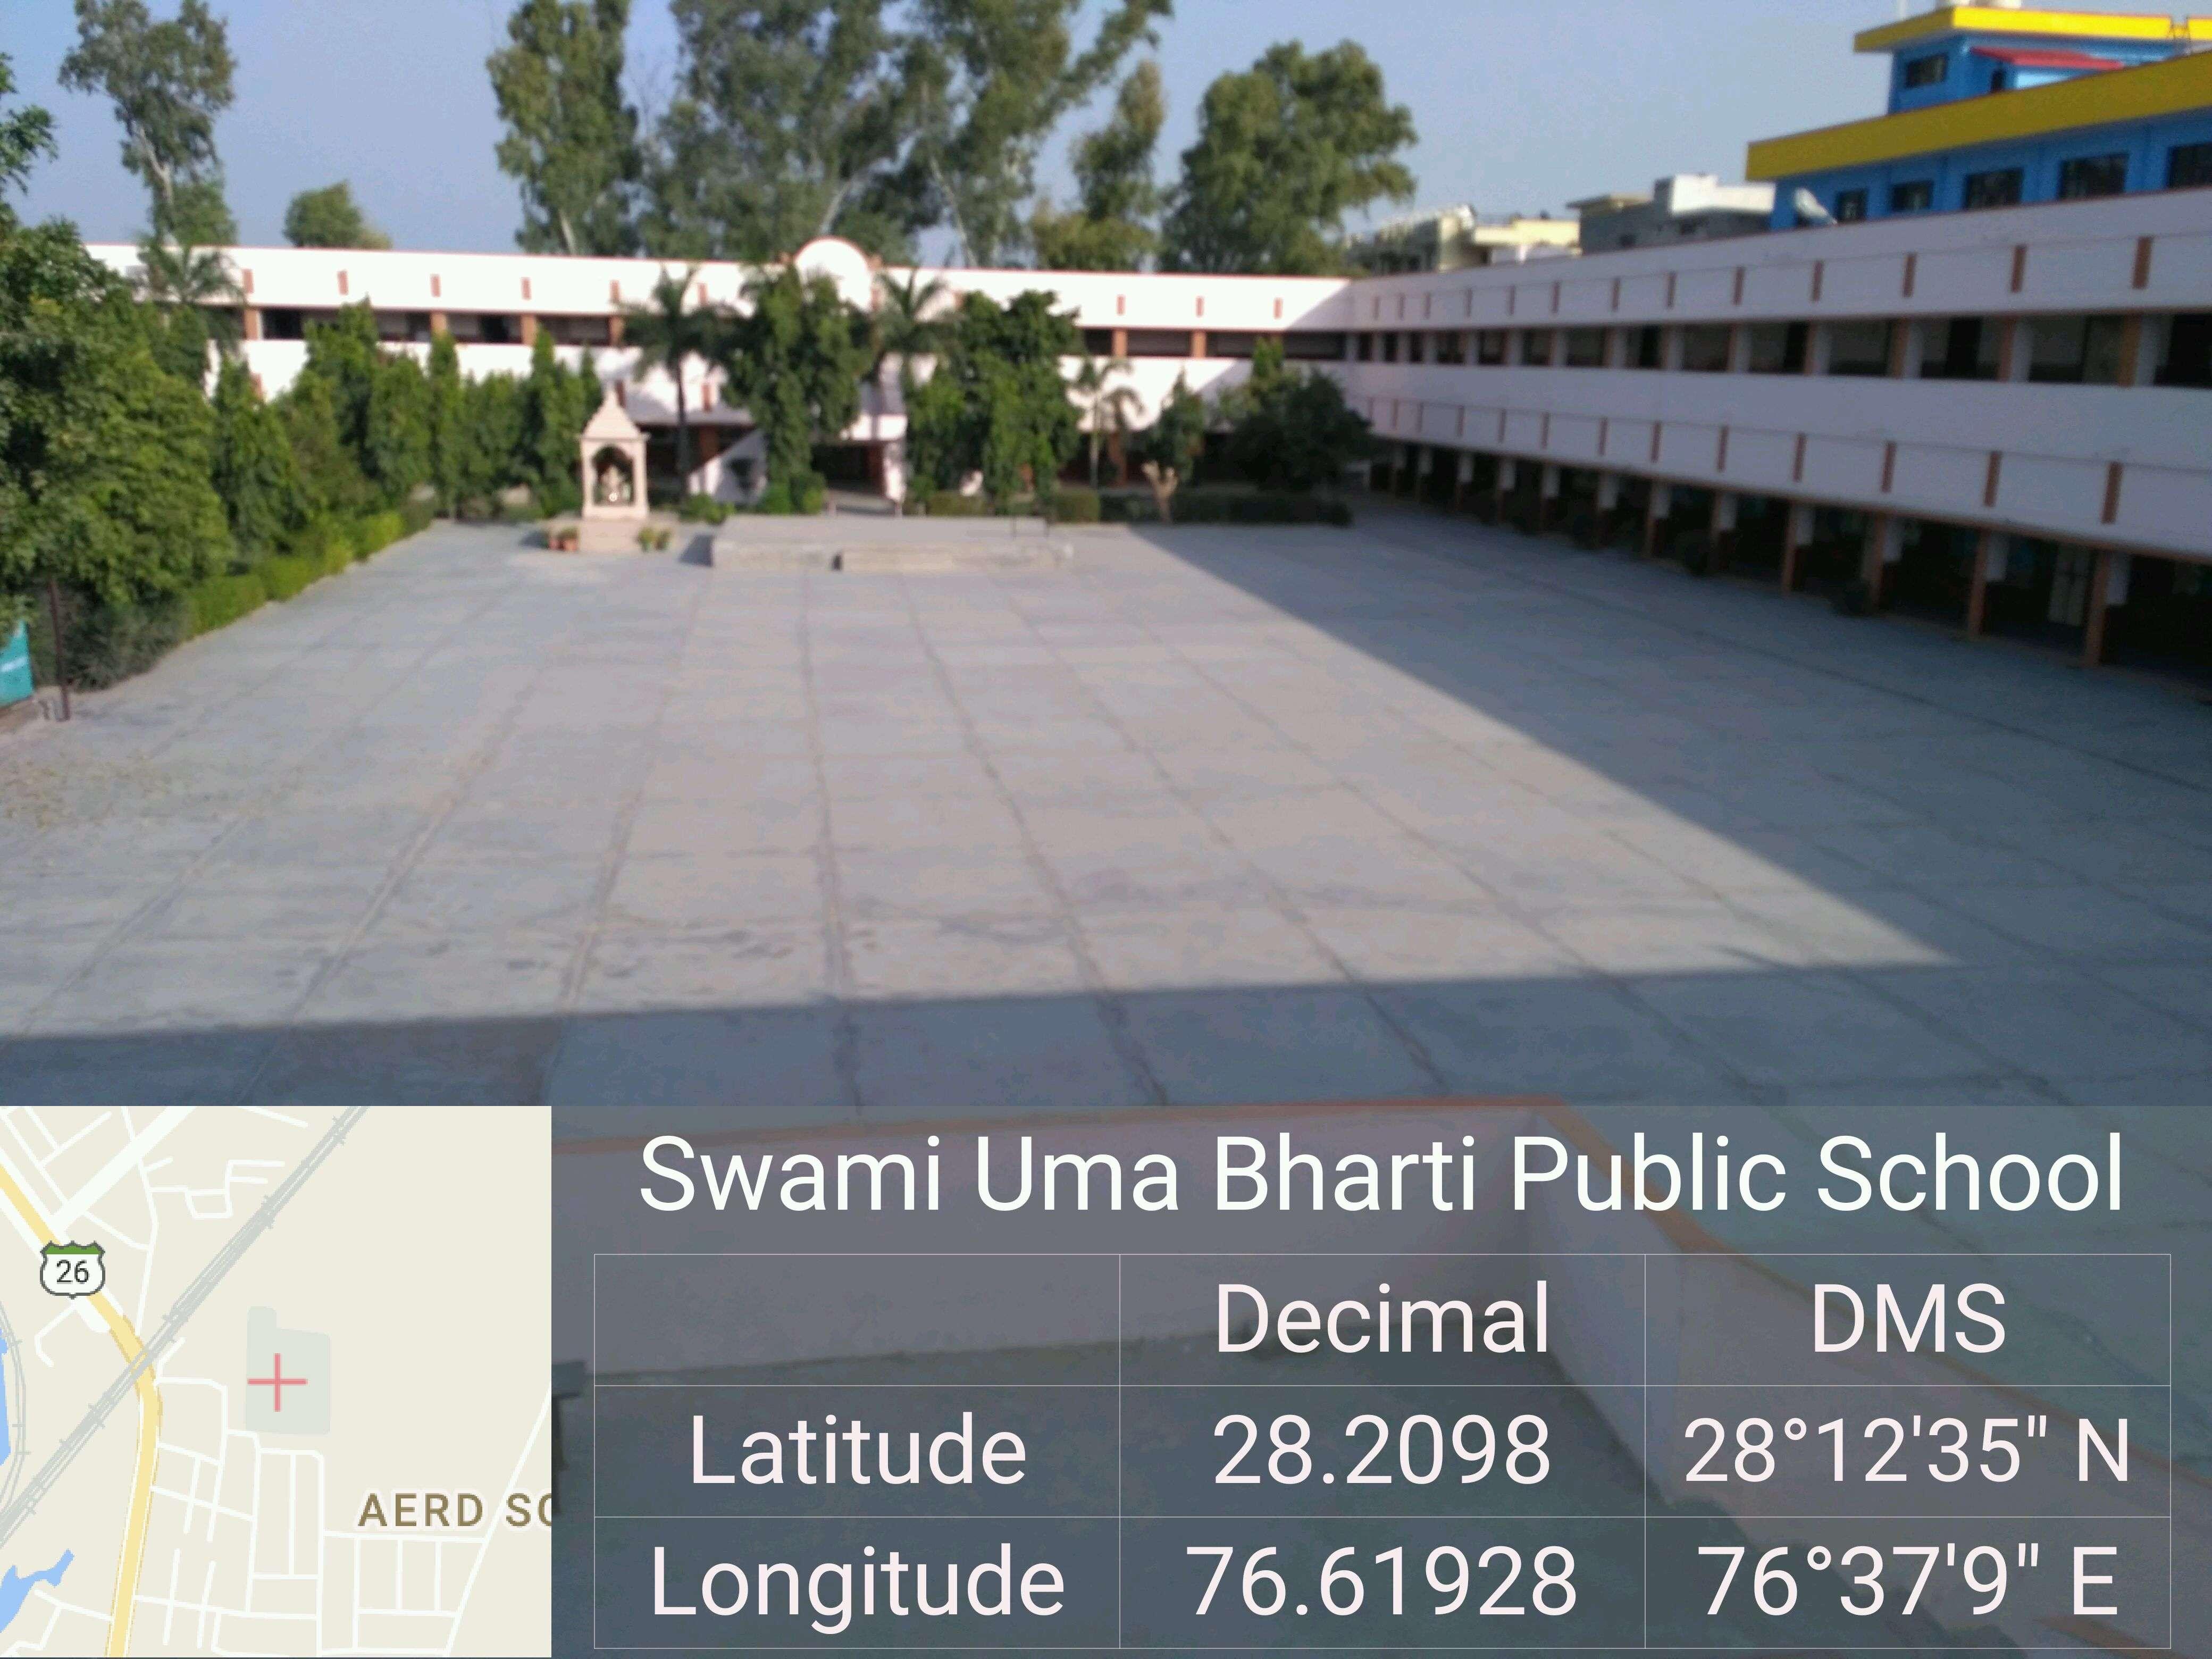 SWAMI UMA BHARTI PUBLIC SCHOOL JHAJJAR ROAD REWARI HARYANA 530019